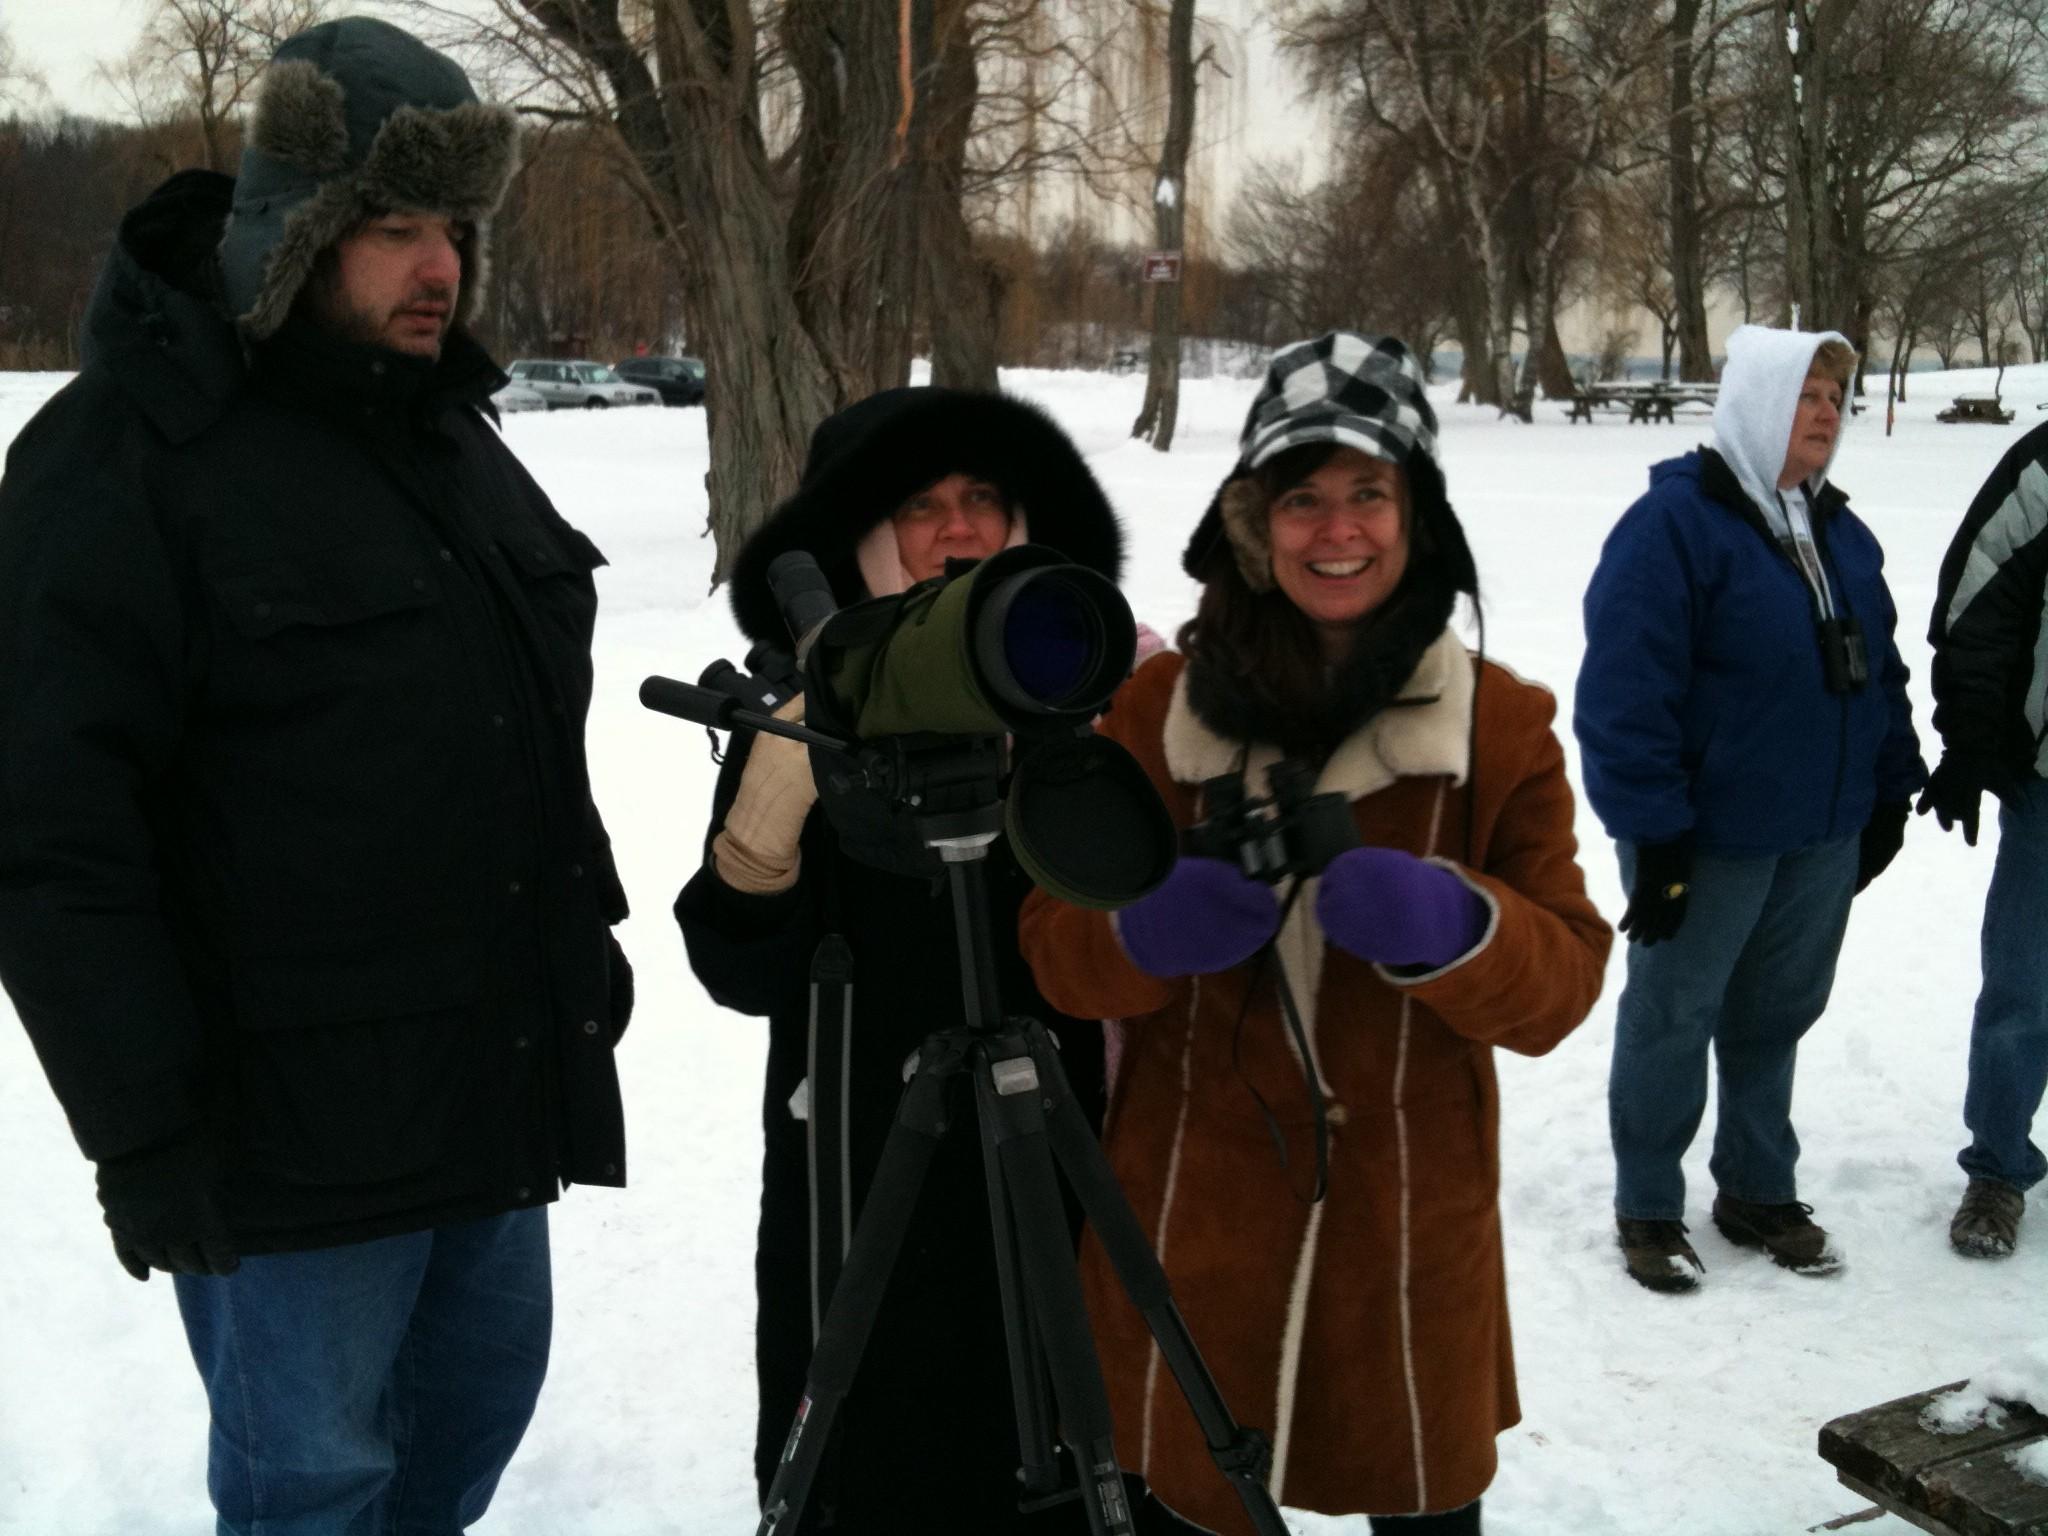 Mitch, Olga, and Helen